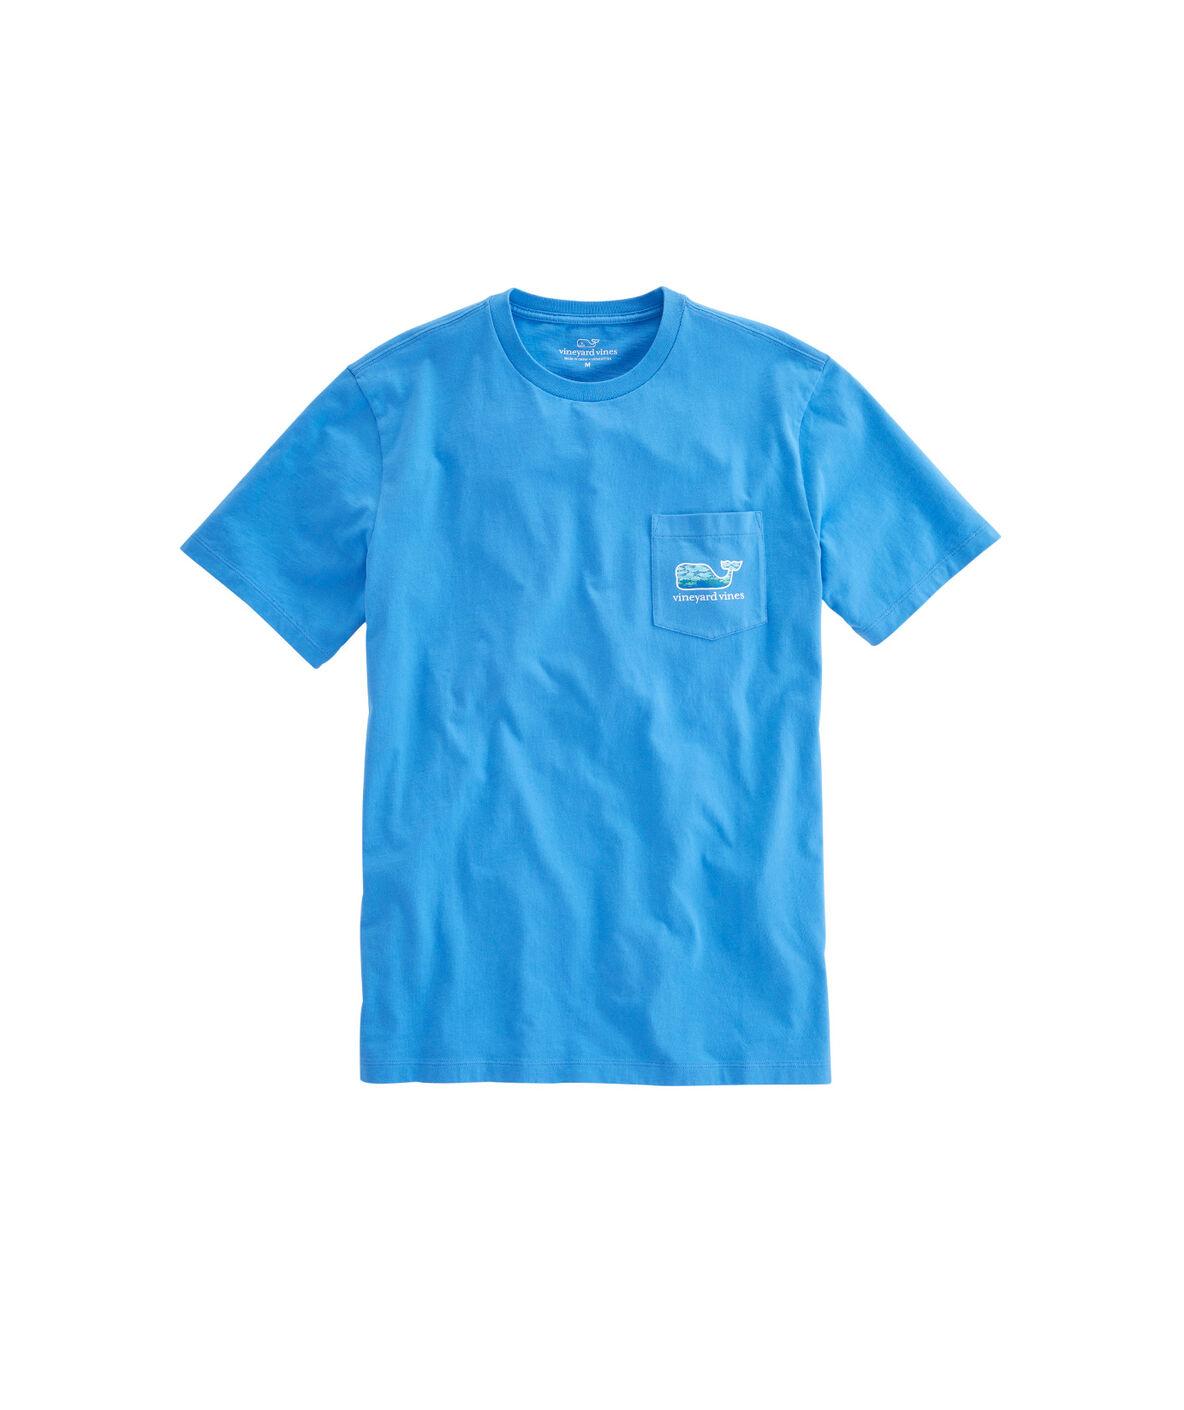 Shop fish lighthouse pocket t shirt at vineyard vines for Vineyard vines fishing shirt